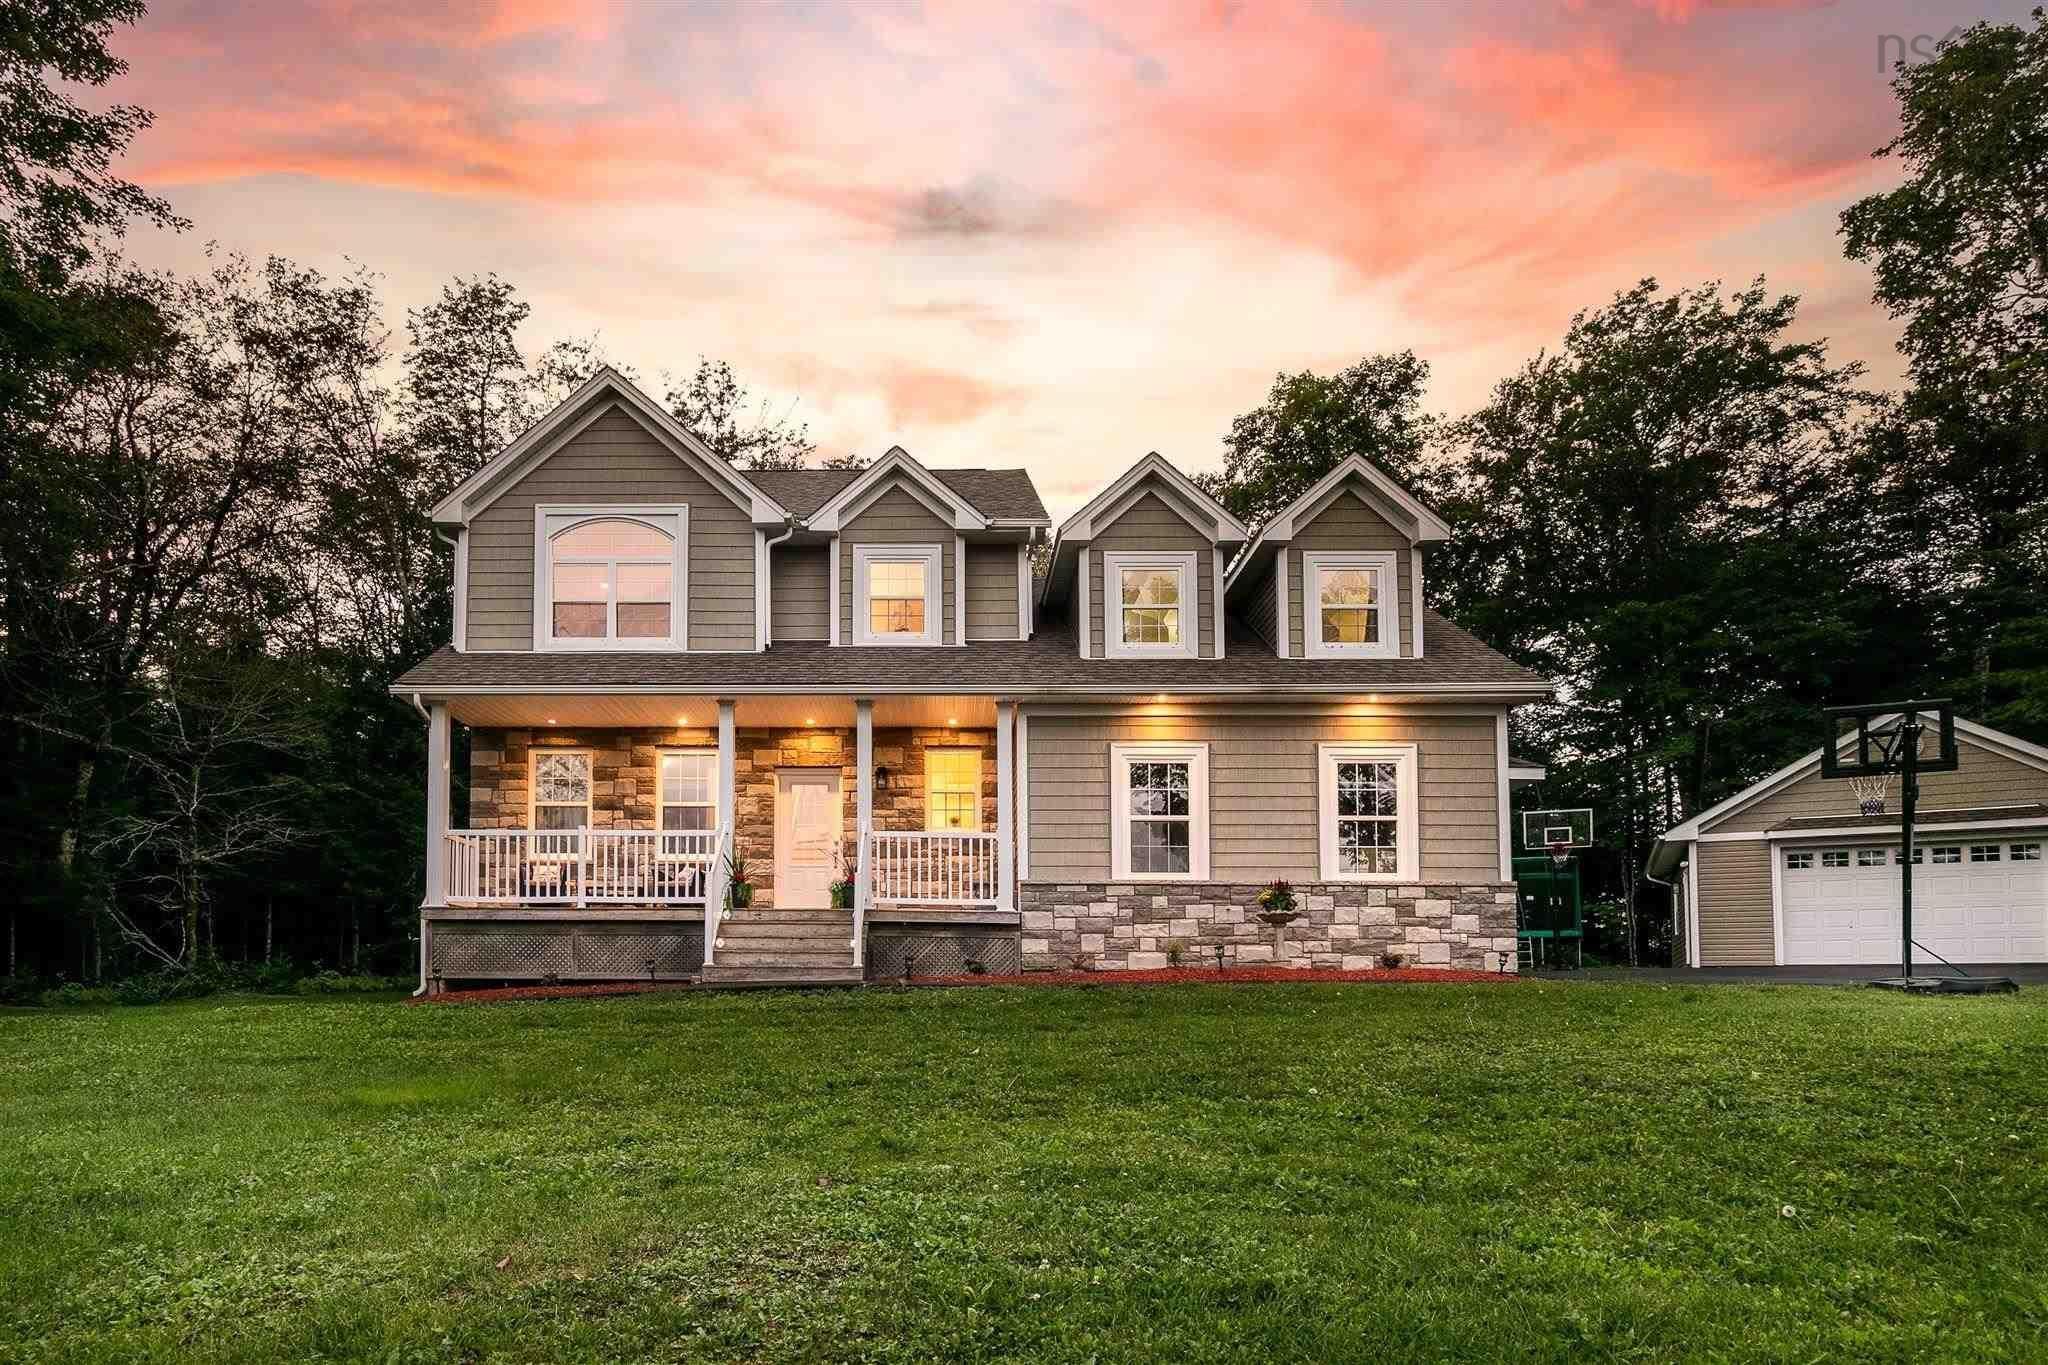 Main Photo: 280 Paula Drive in Hammonds Plains: 21-Kingswood, Haliburton Hills, Hammonds Pl. Residential for sale (Halifax-Dartmouth)  : MLS®# 202122027